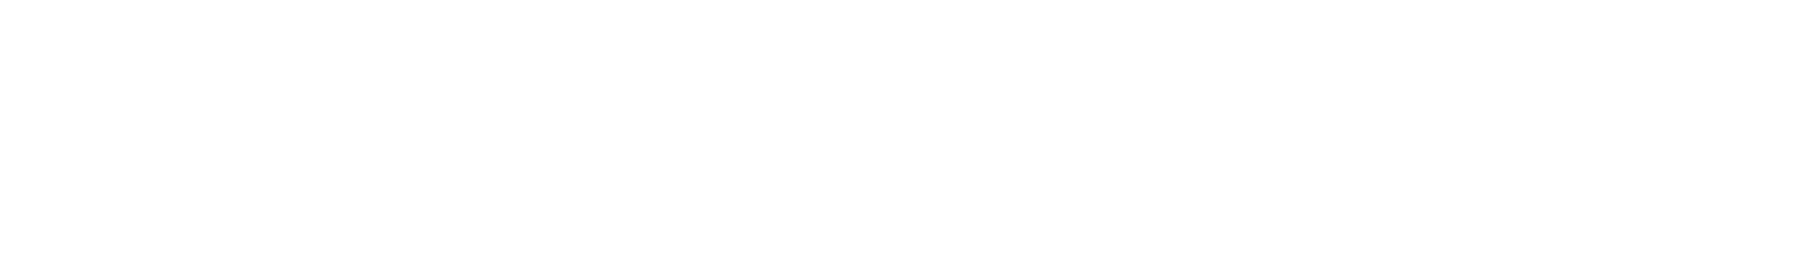 zttc synth loop 21 c 126 bpm